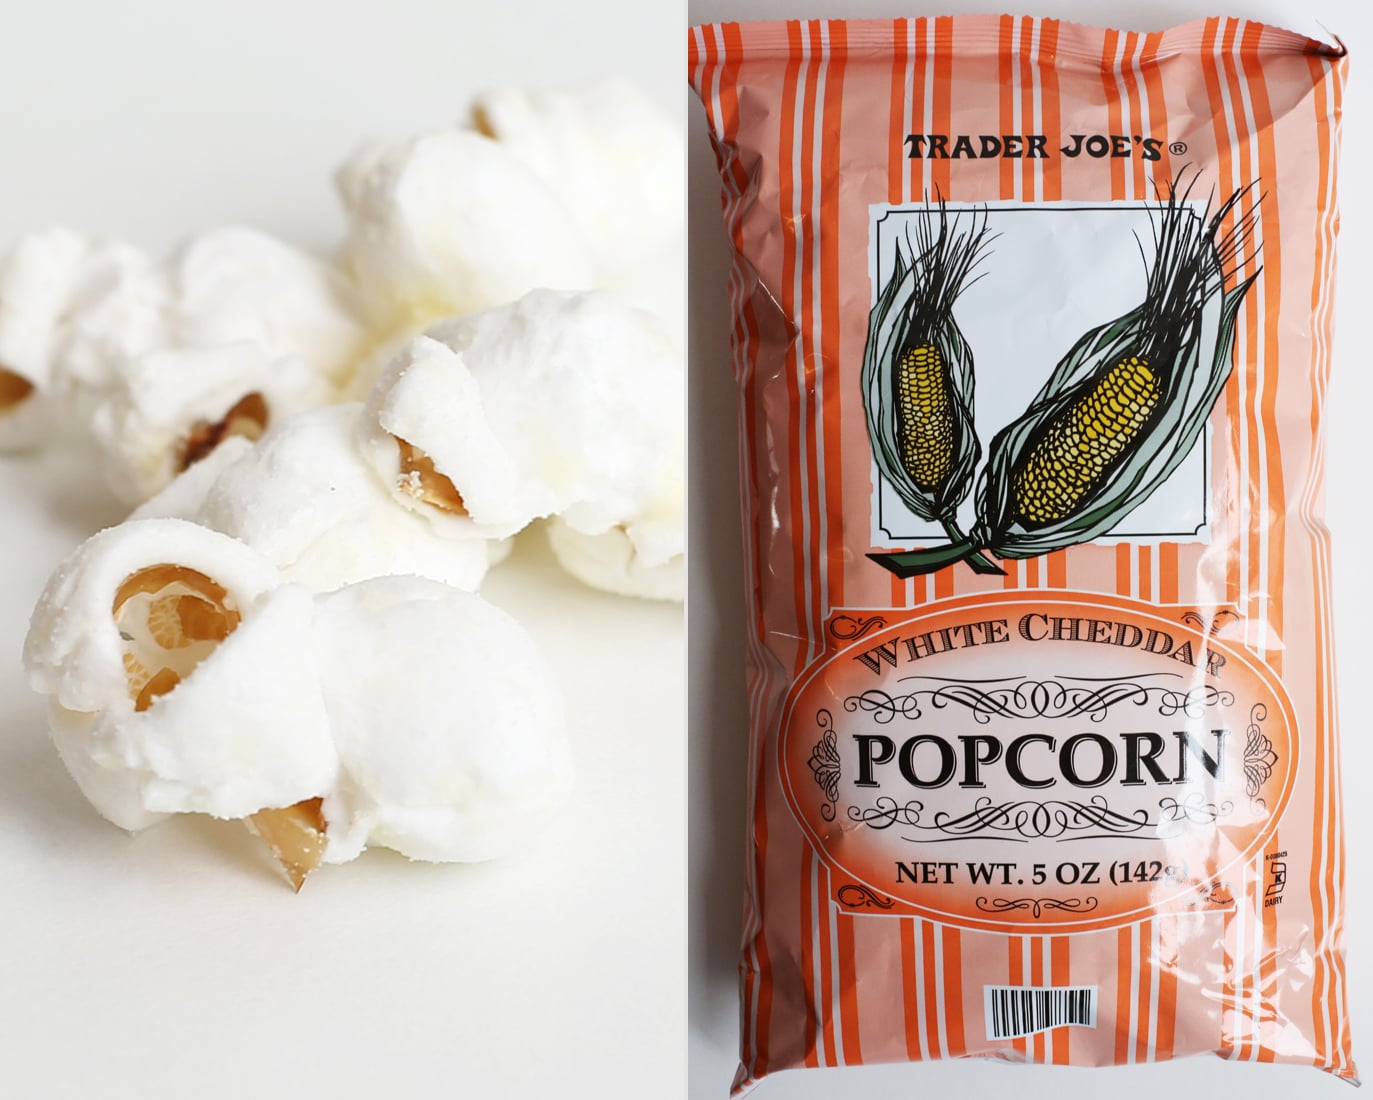 White Cheddar Popcorn ($2)